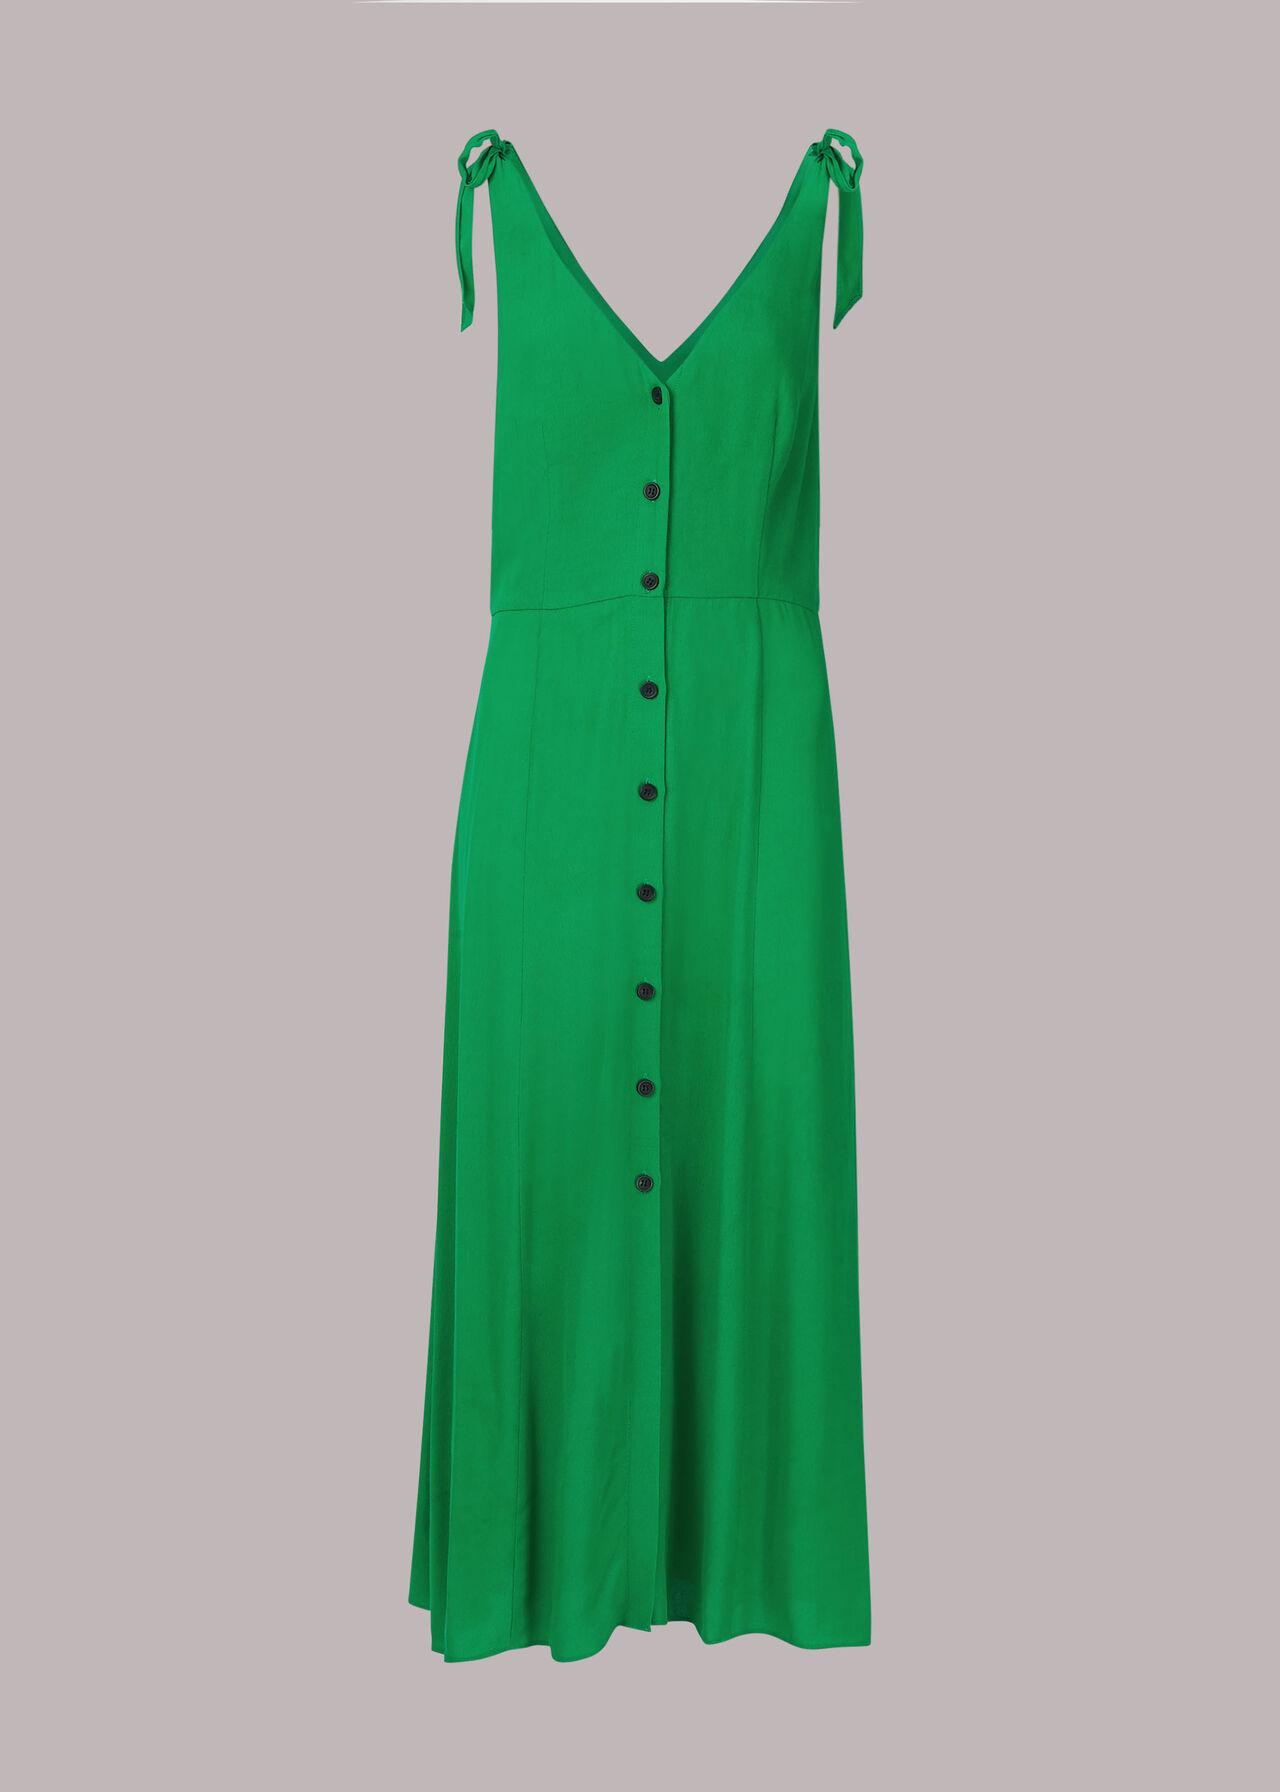 Hanna Tie Shoulder Dress Green